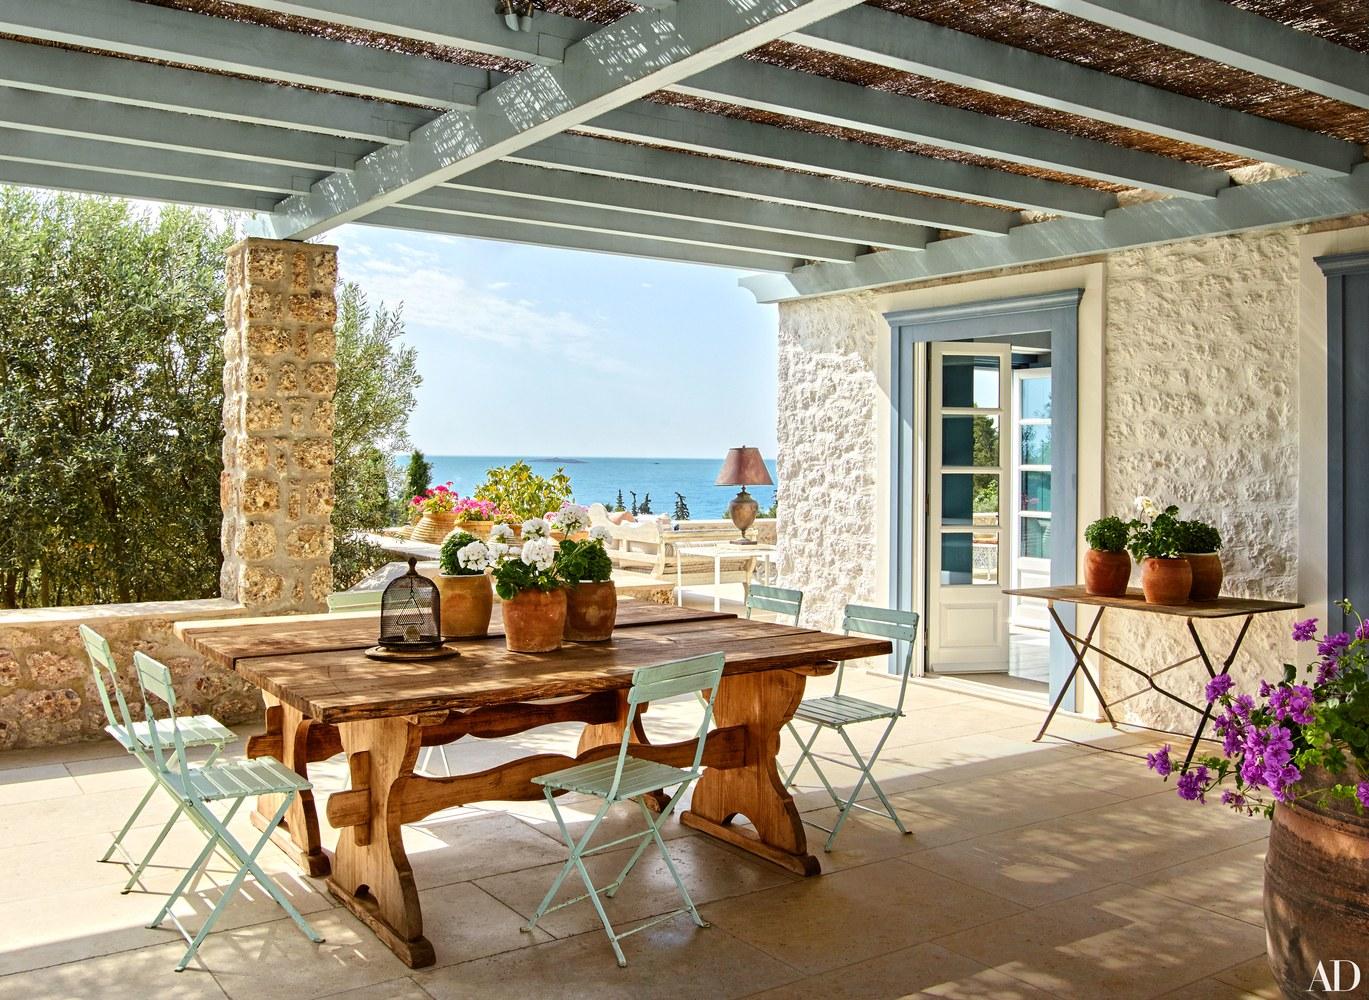 14-visita-guiada-casa-de-ferias-grega-investe-no-azul-claro-praiano